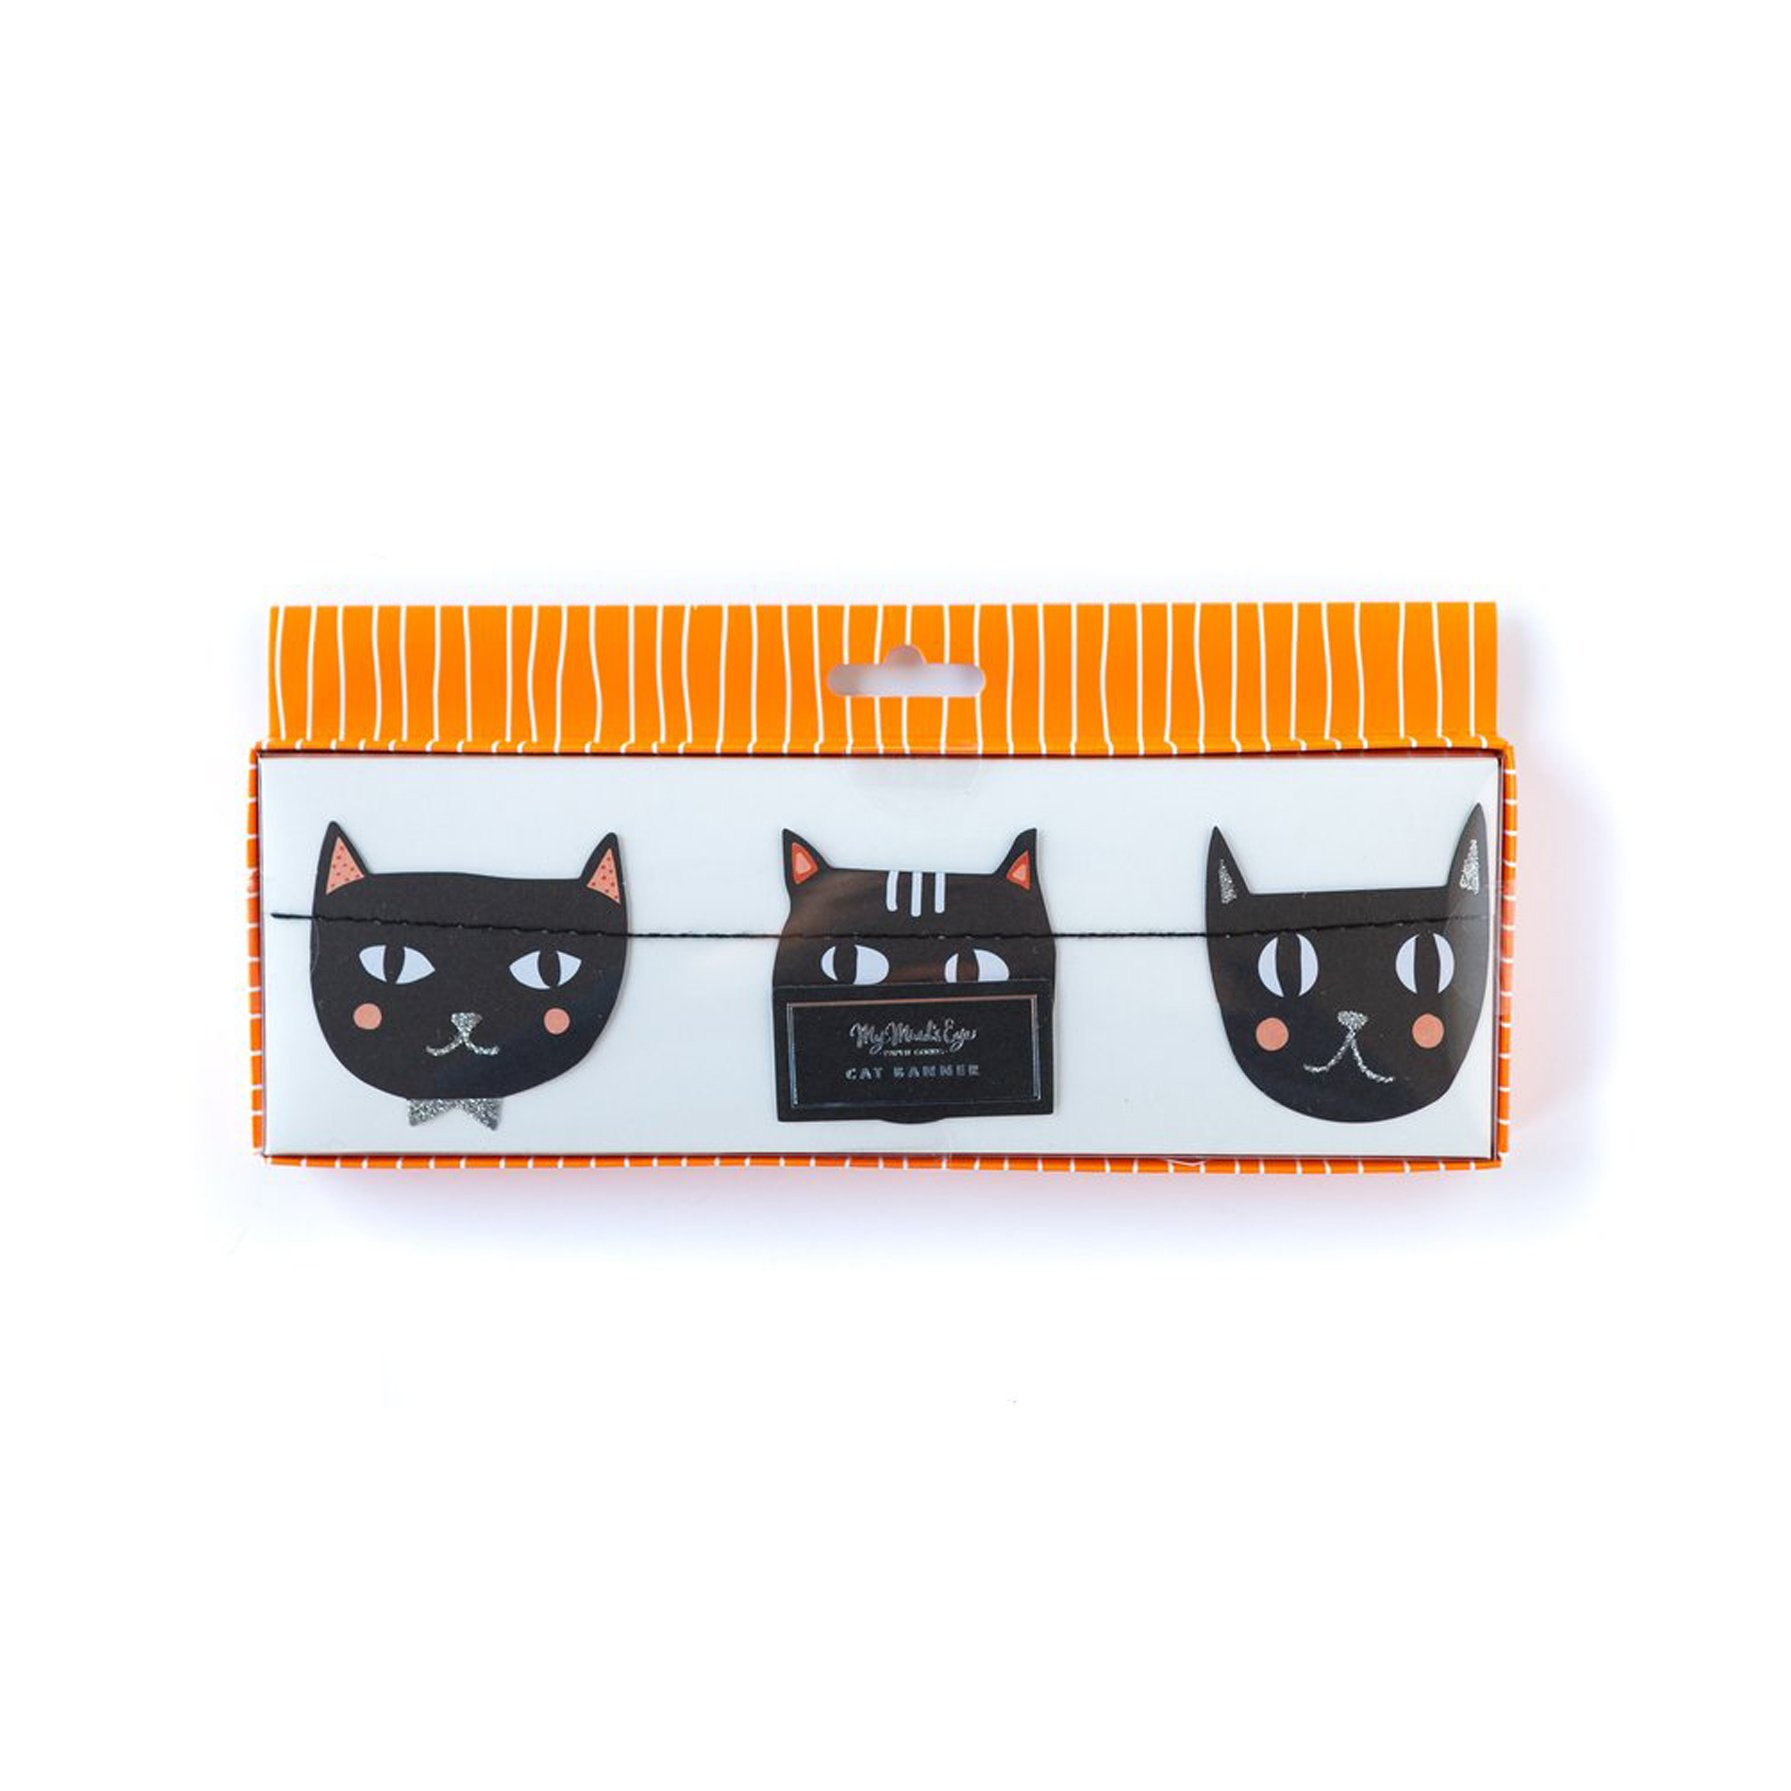 BUY ME / NEW ITEM $12.99 each Halloween Black Cat 6ft Paper Garland